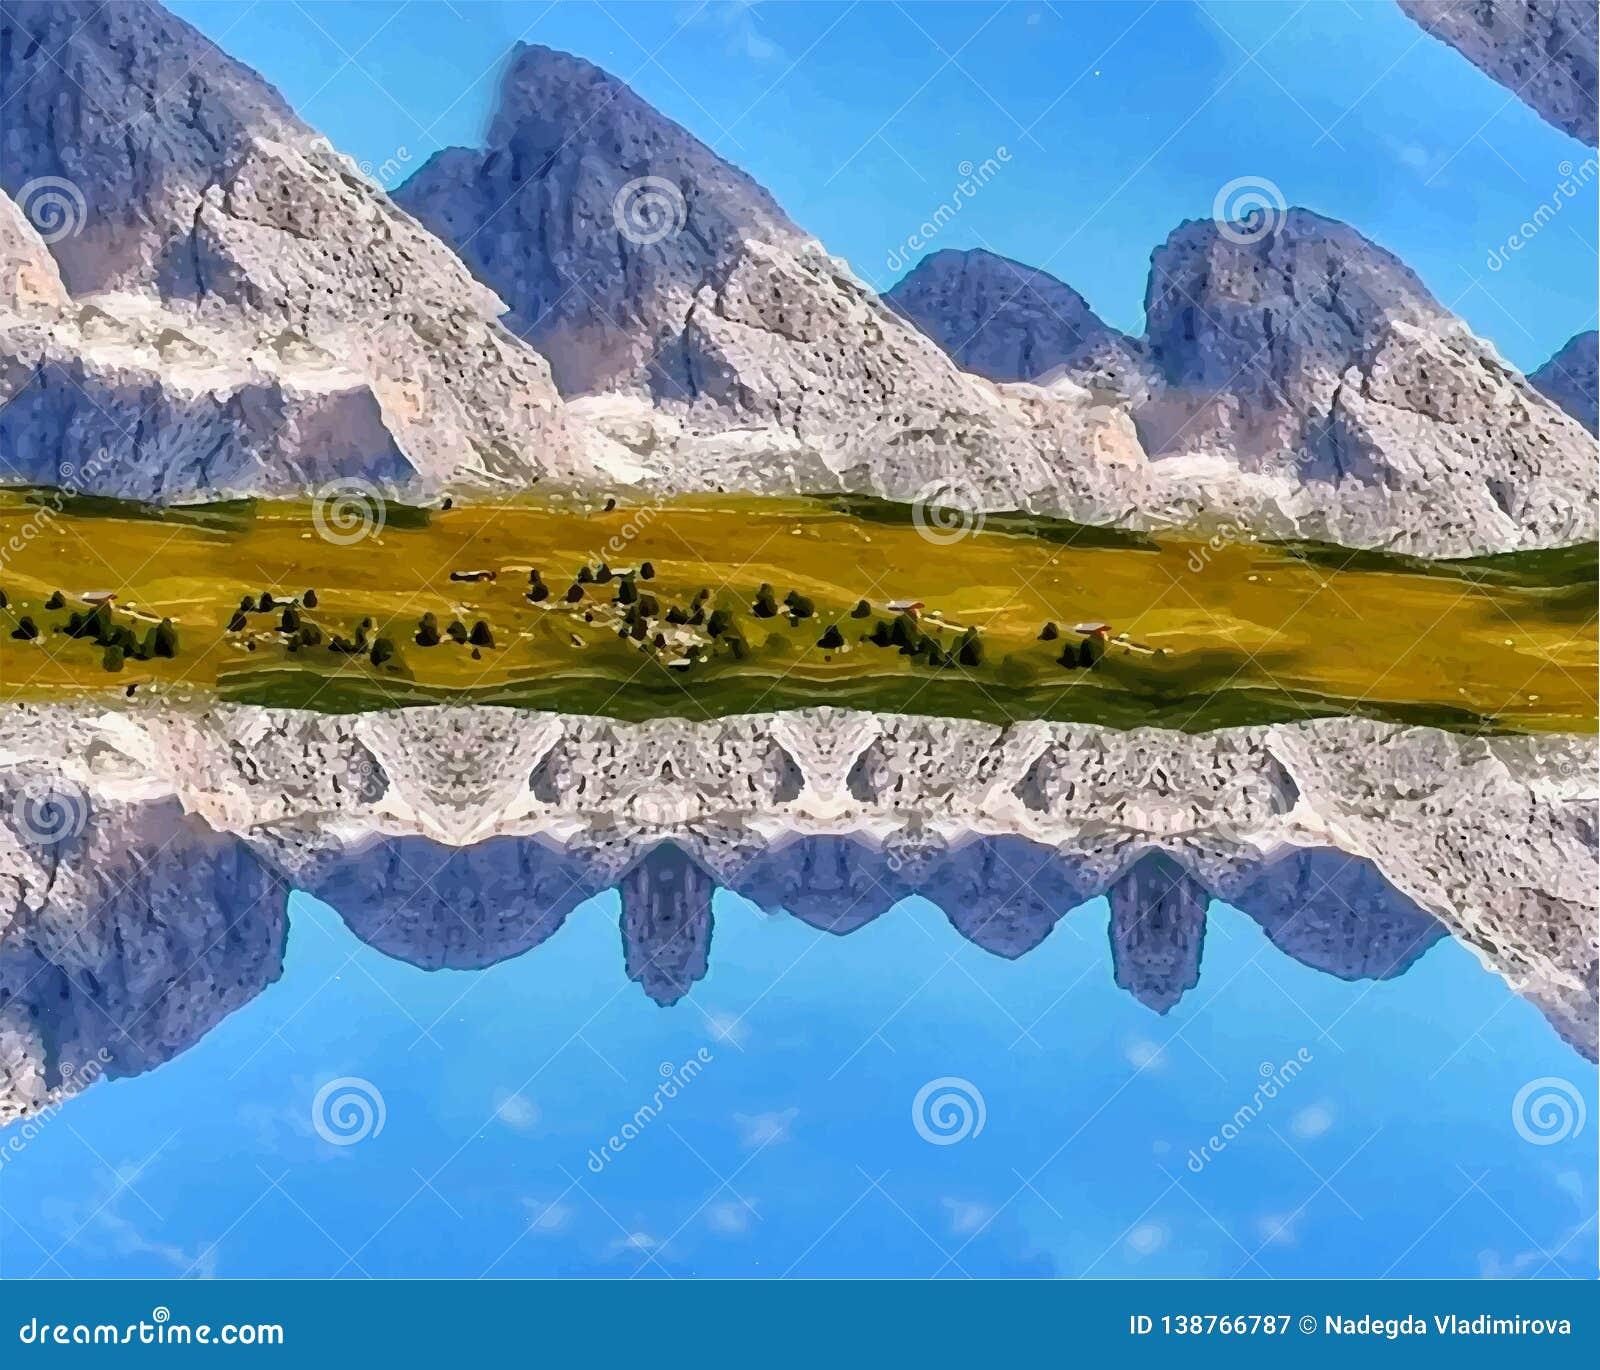 Illustration of mountains, earth, sky, liquid abstraction, liquid mountains abstraction, liquid sky abstraction.